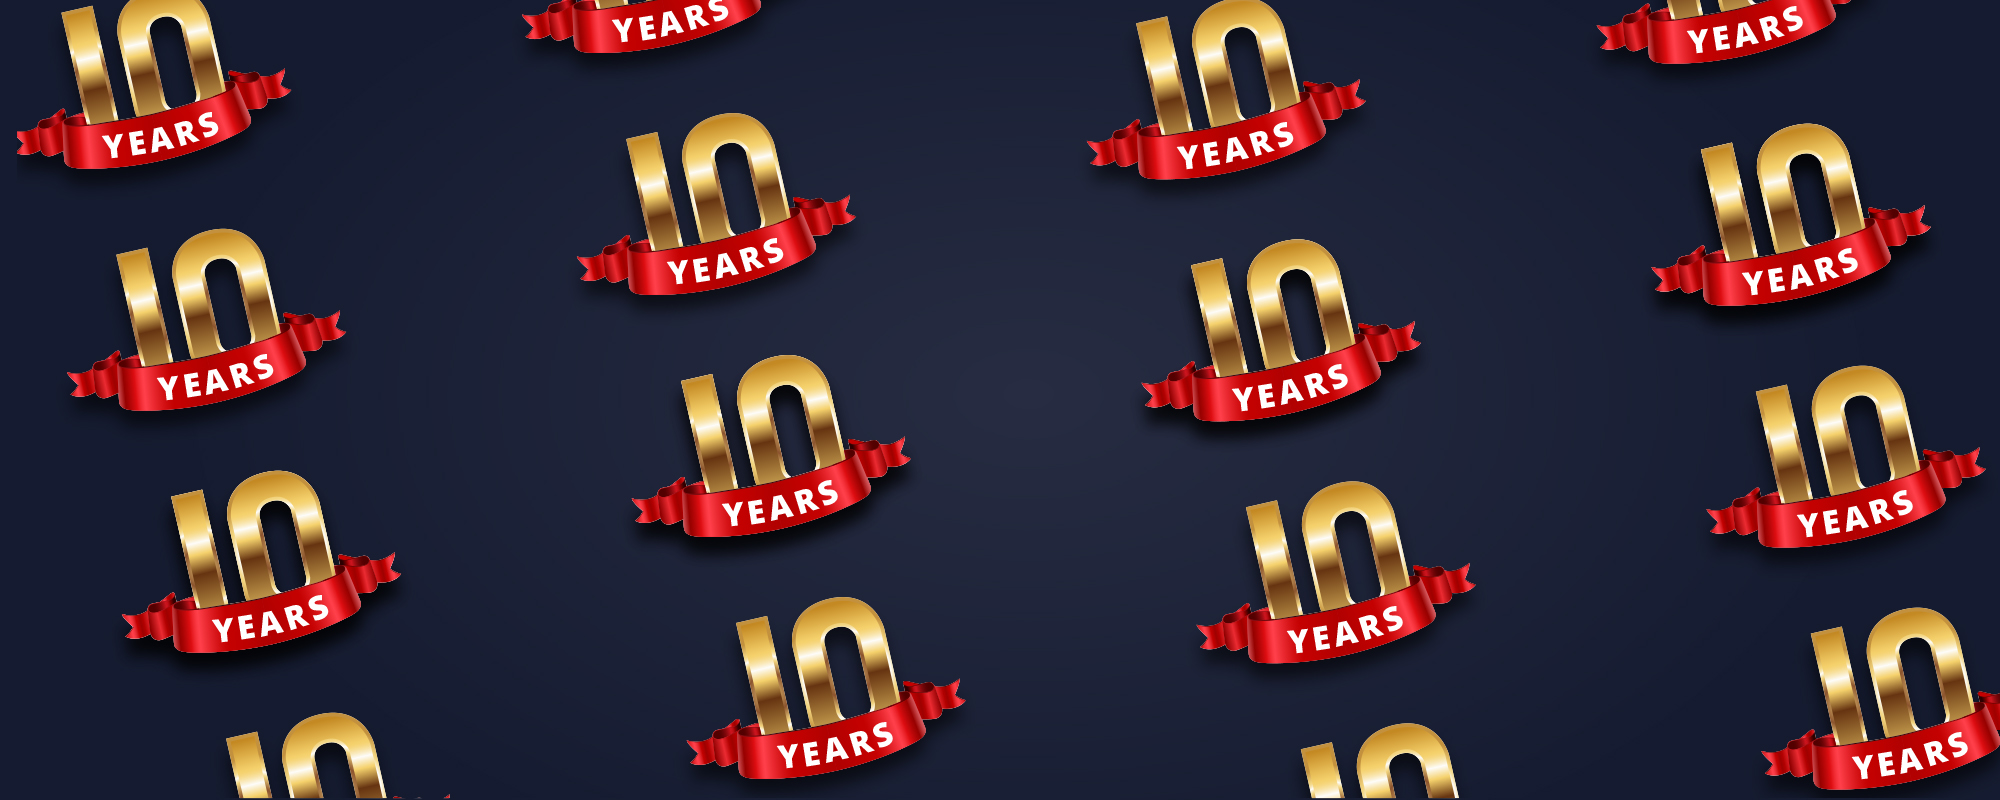 eic-10-years-blog-2